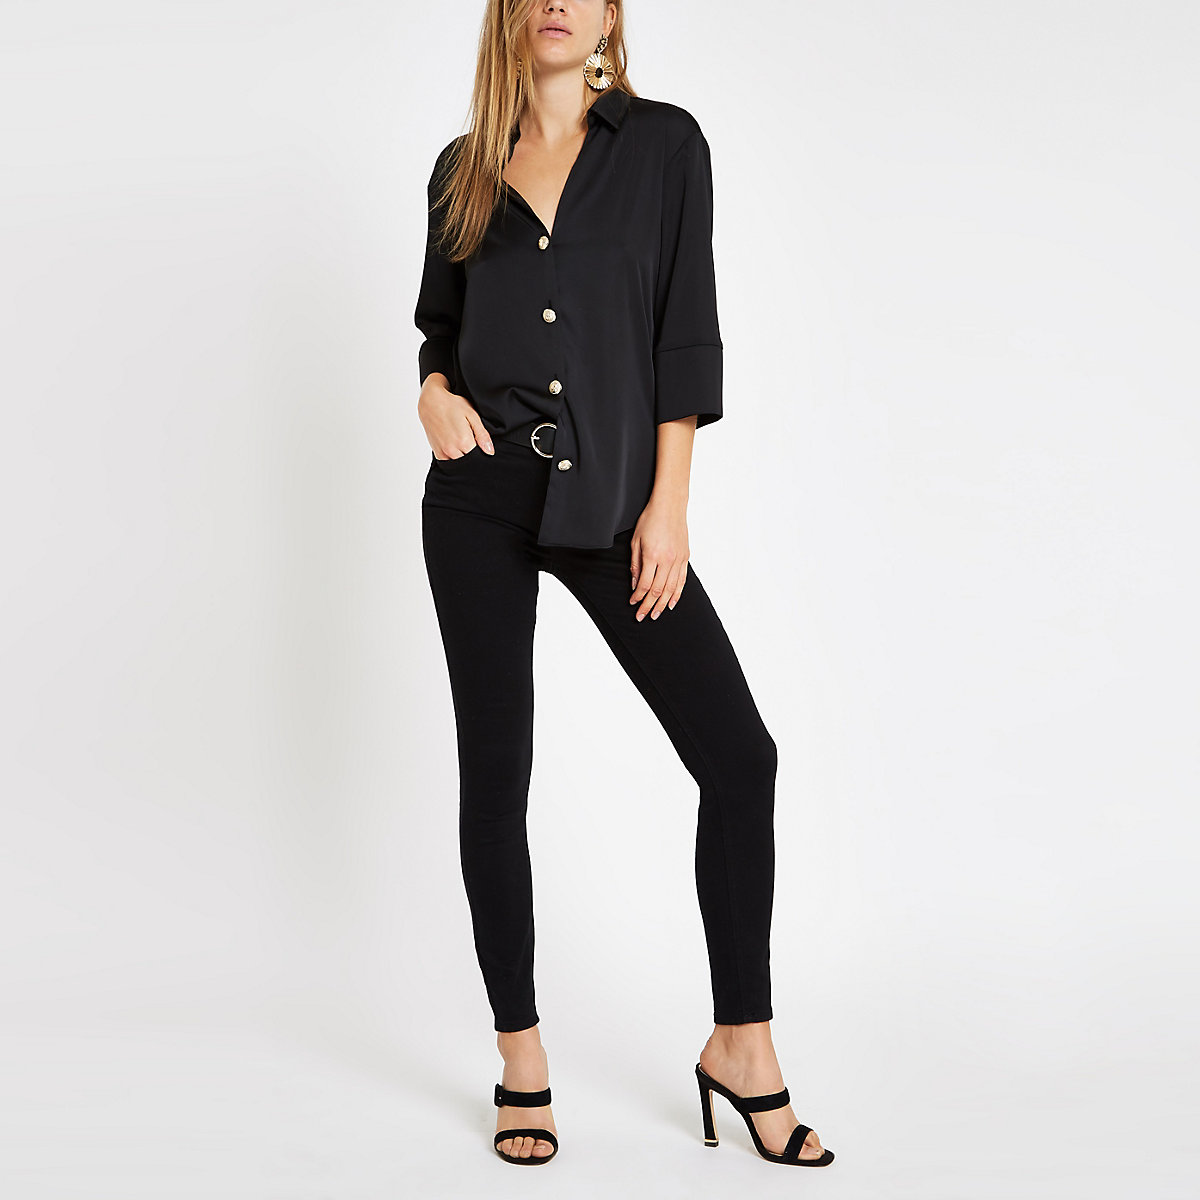 Black button front bar back satin blouse